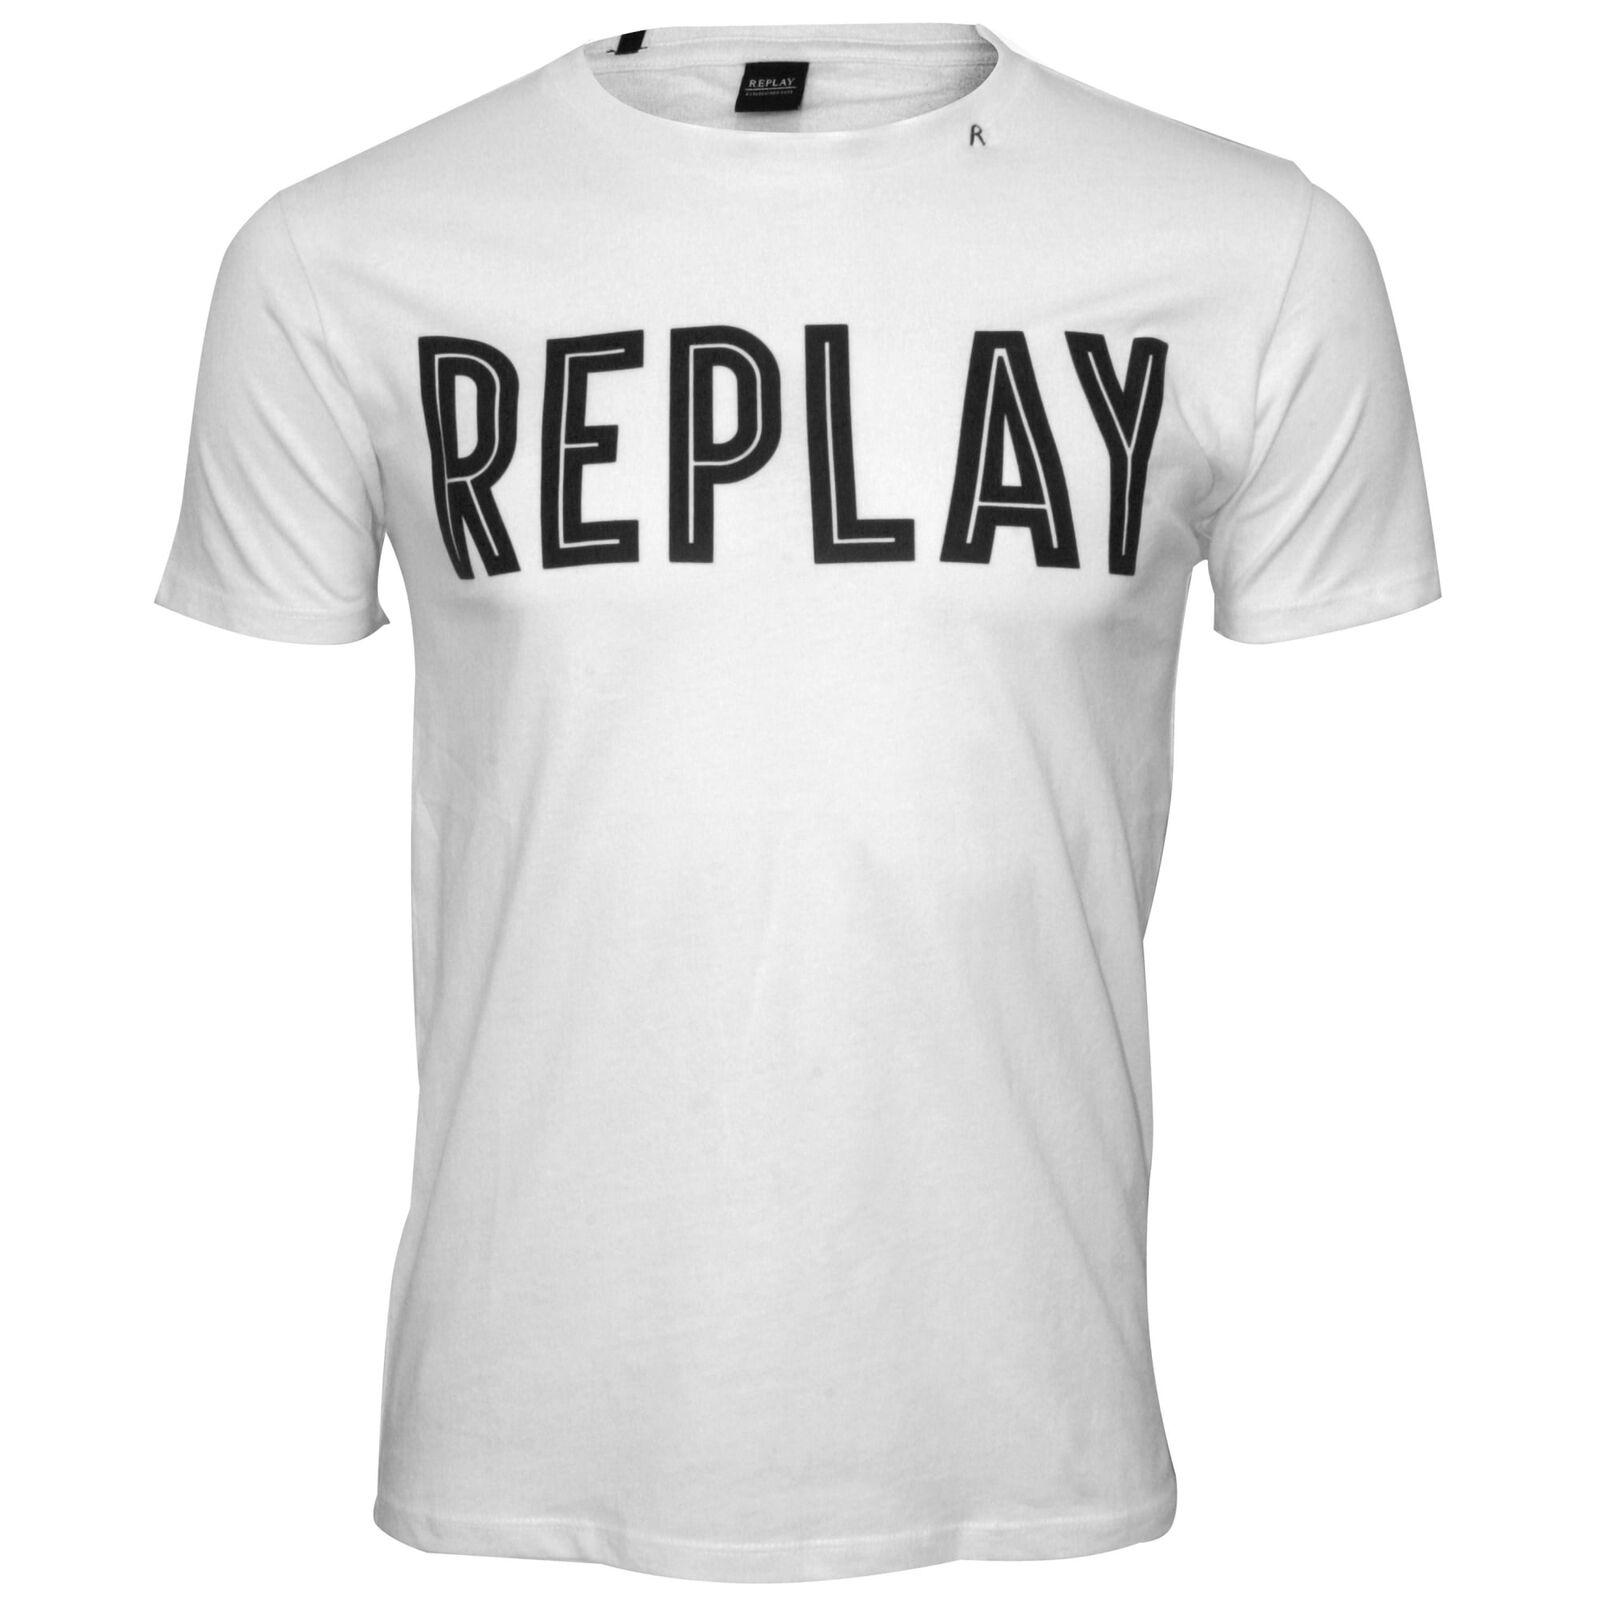 ... REPLAY Logo in grassetto Logo REPLAY T-shirt Uomo b2b7b70f40f